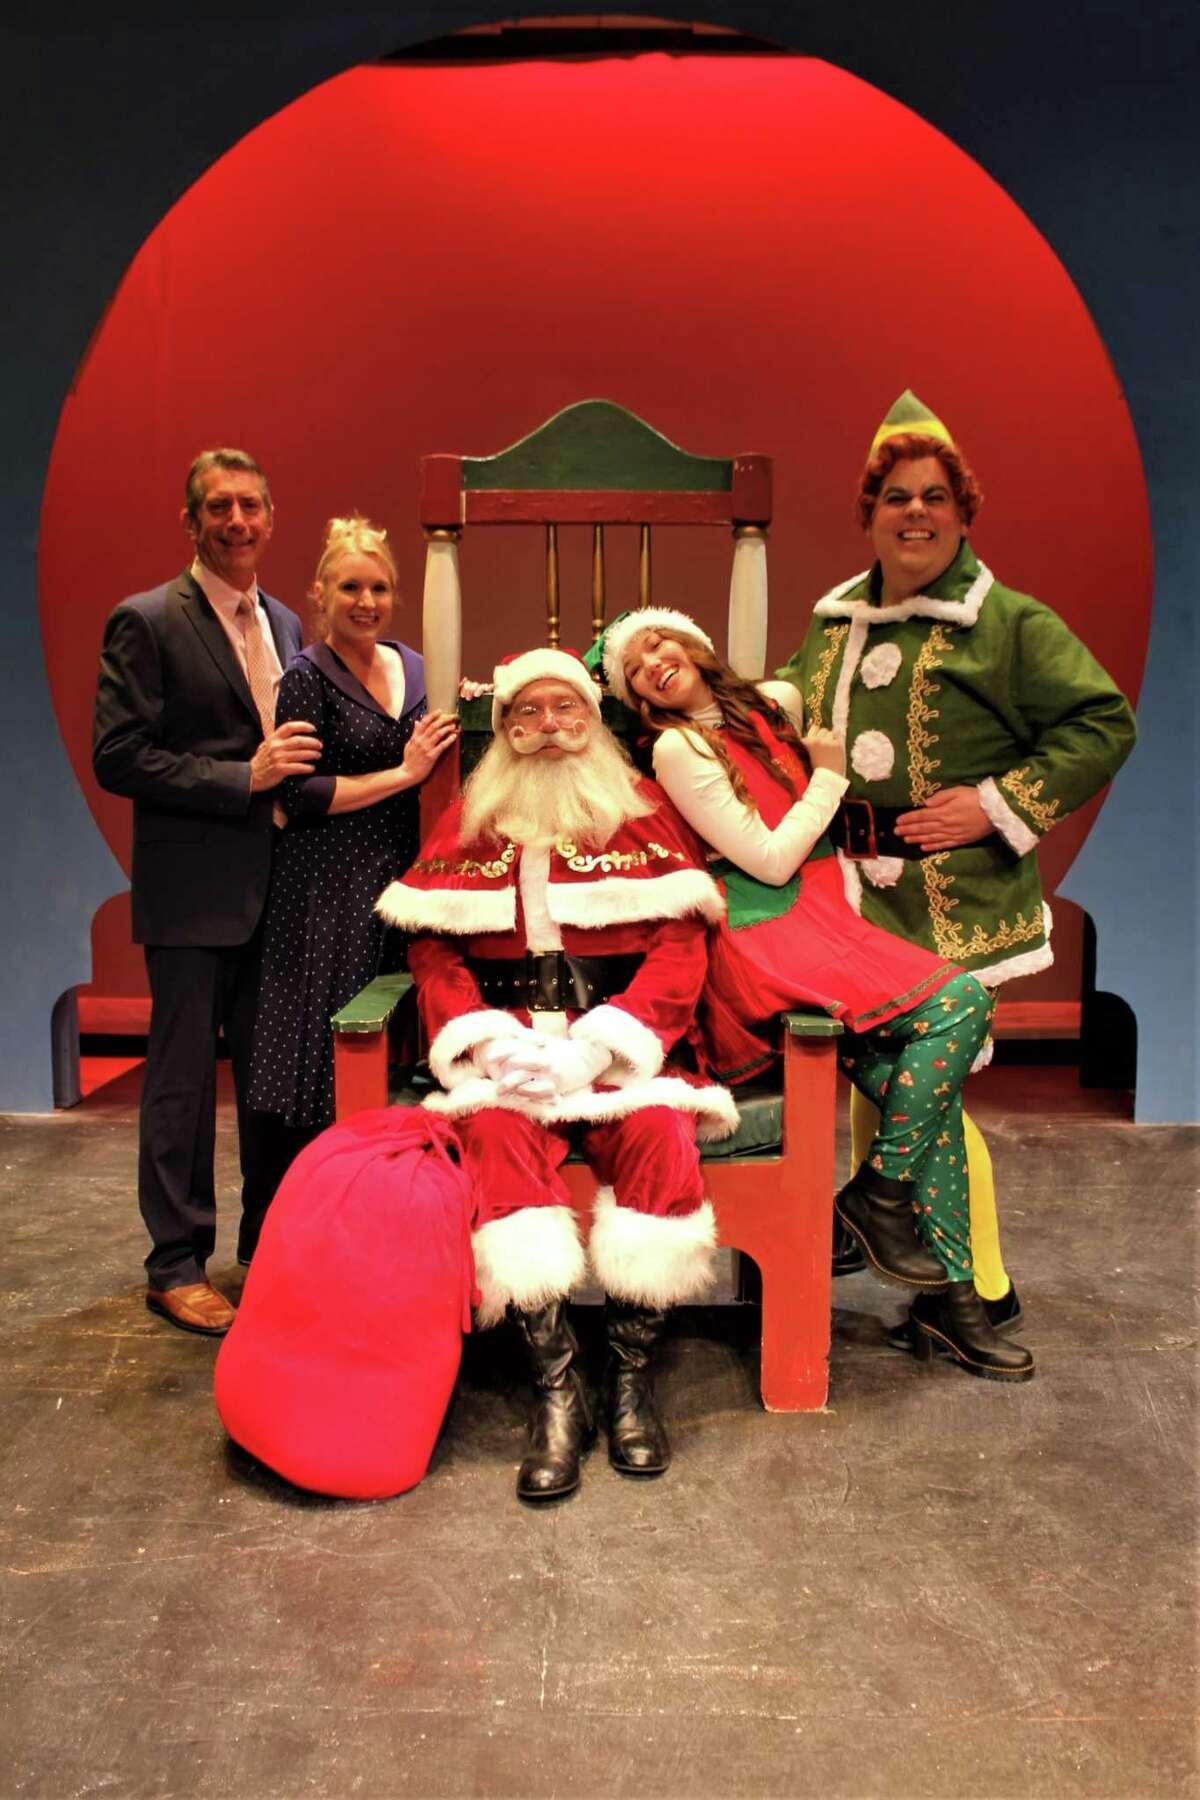 """Elf: The Musical"" at Seven Angels Theatre in Waterbury runs through Dec. 22."